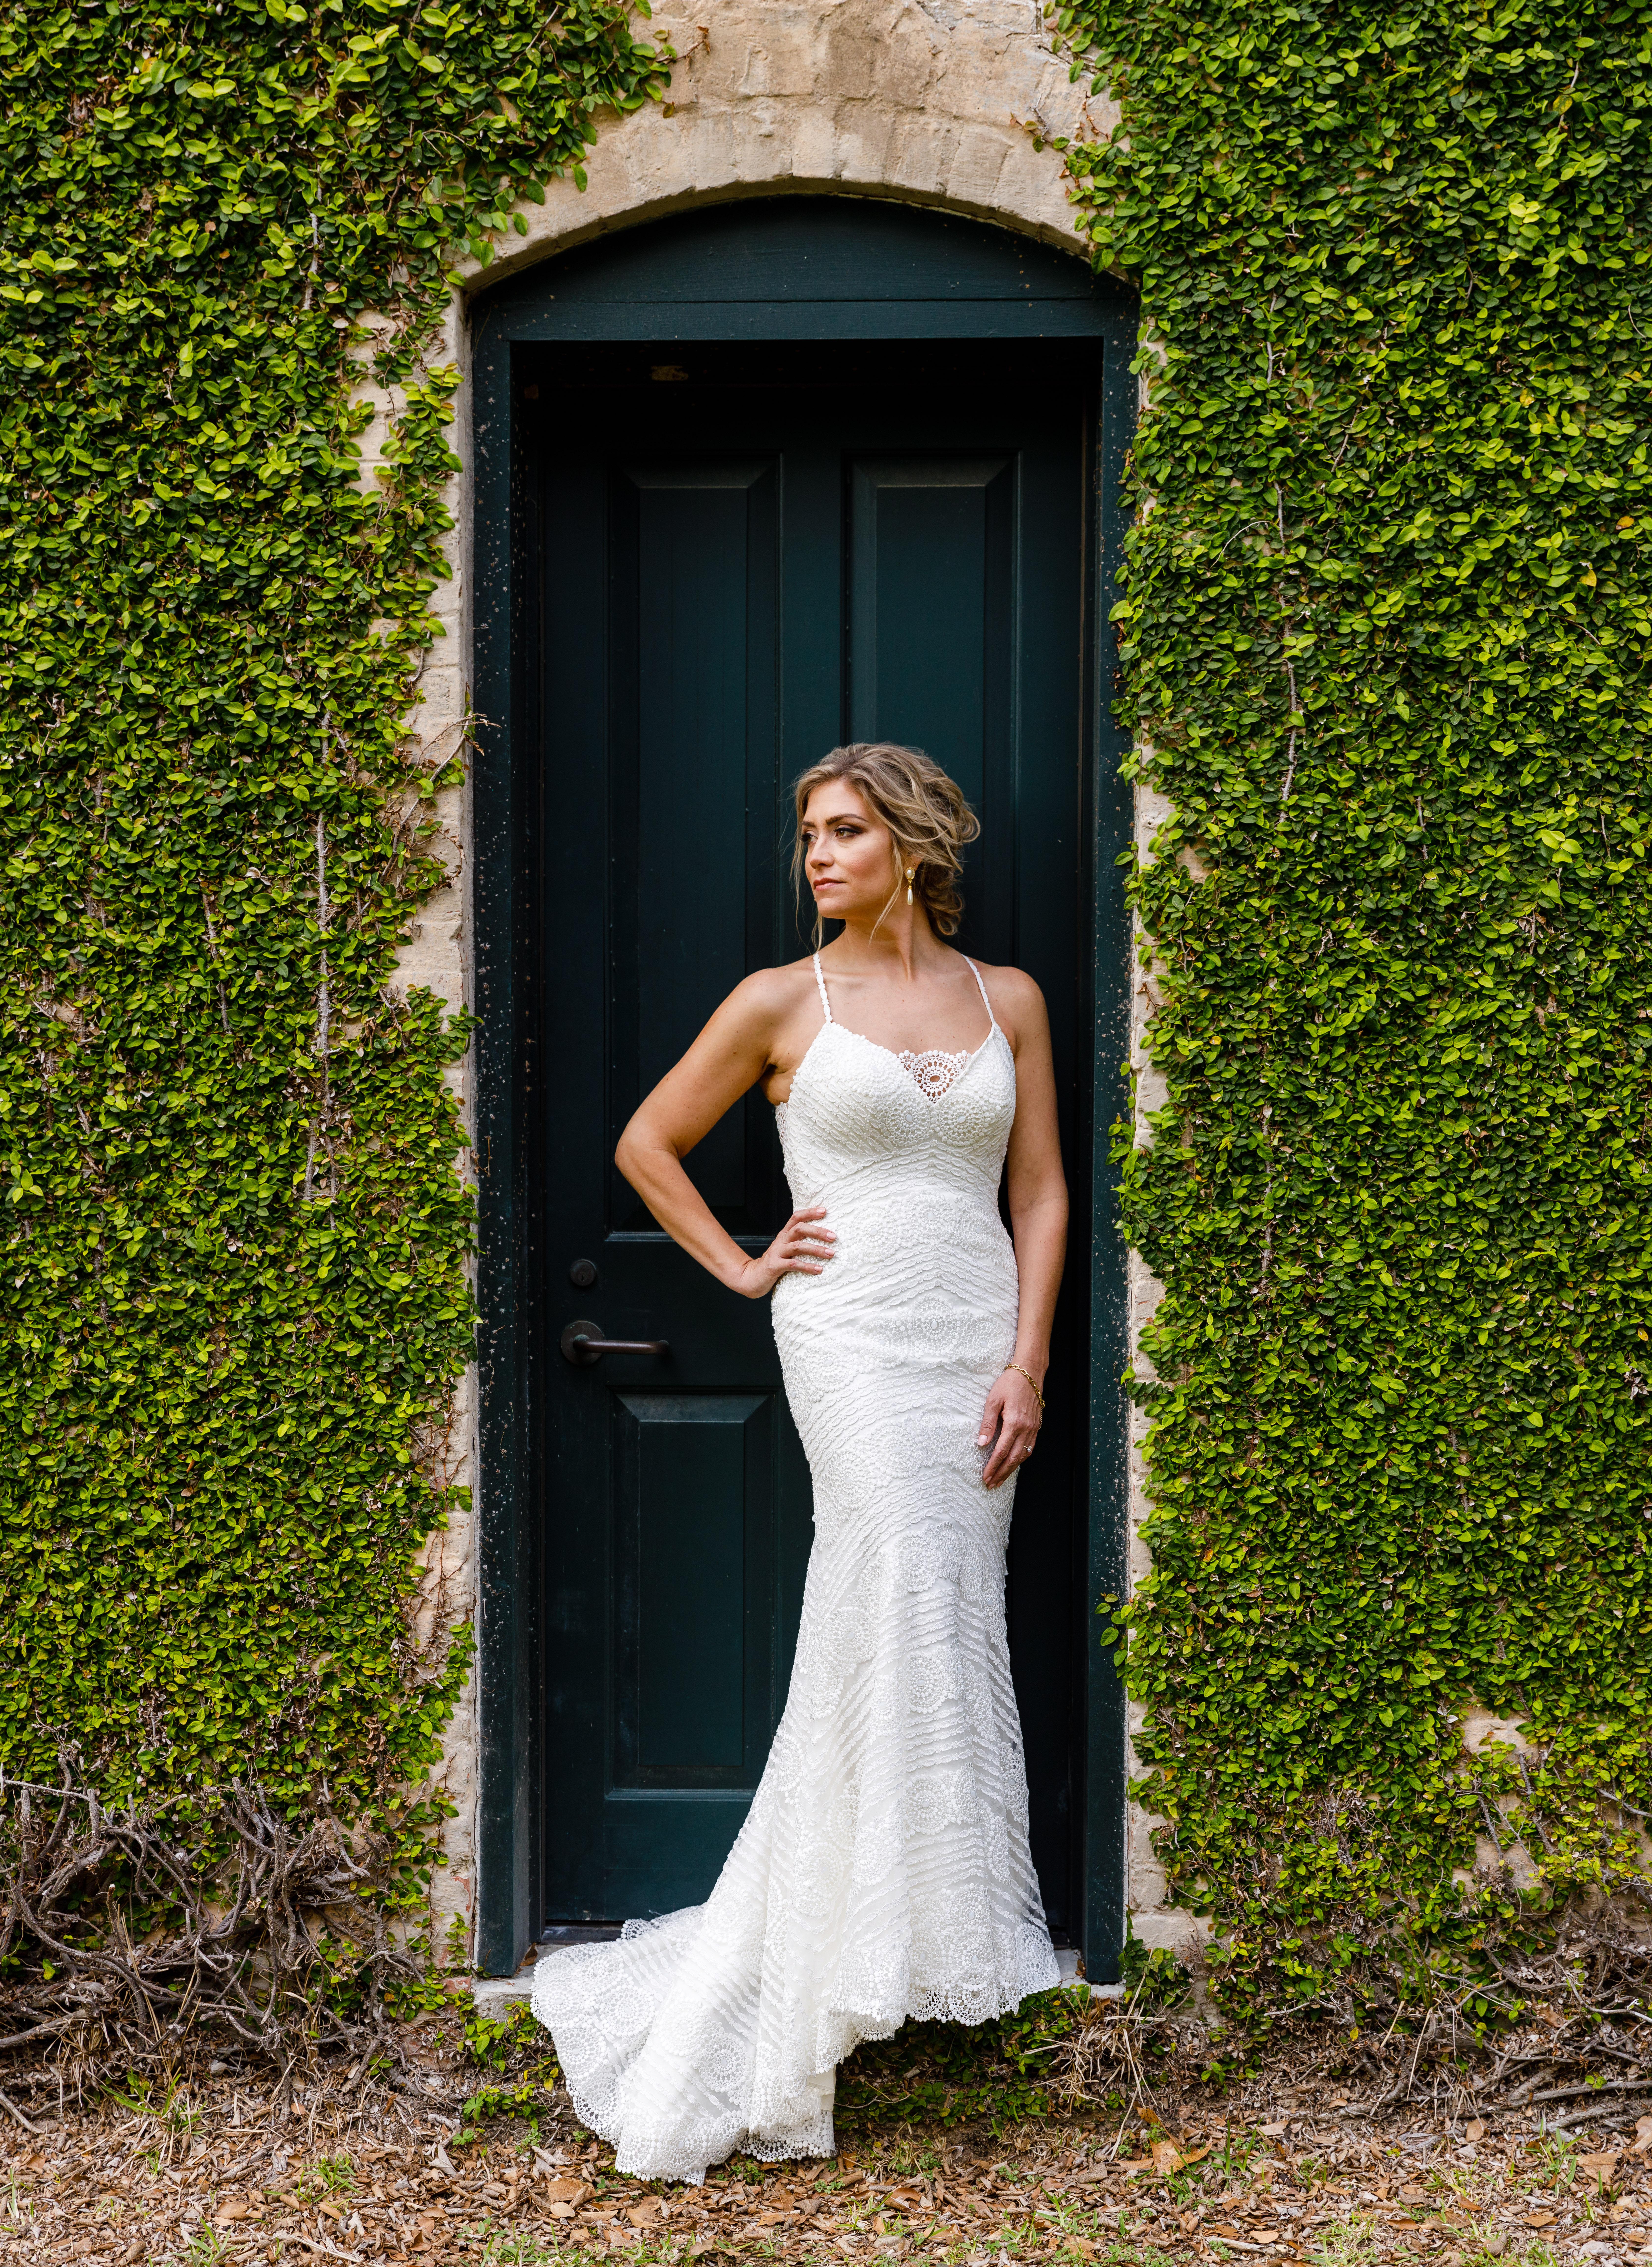 Youngsville-lafayette-portrait-family-wedding-photographer-.jpg